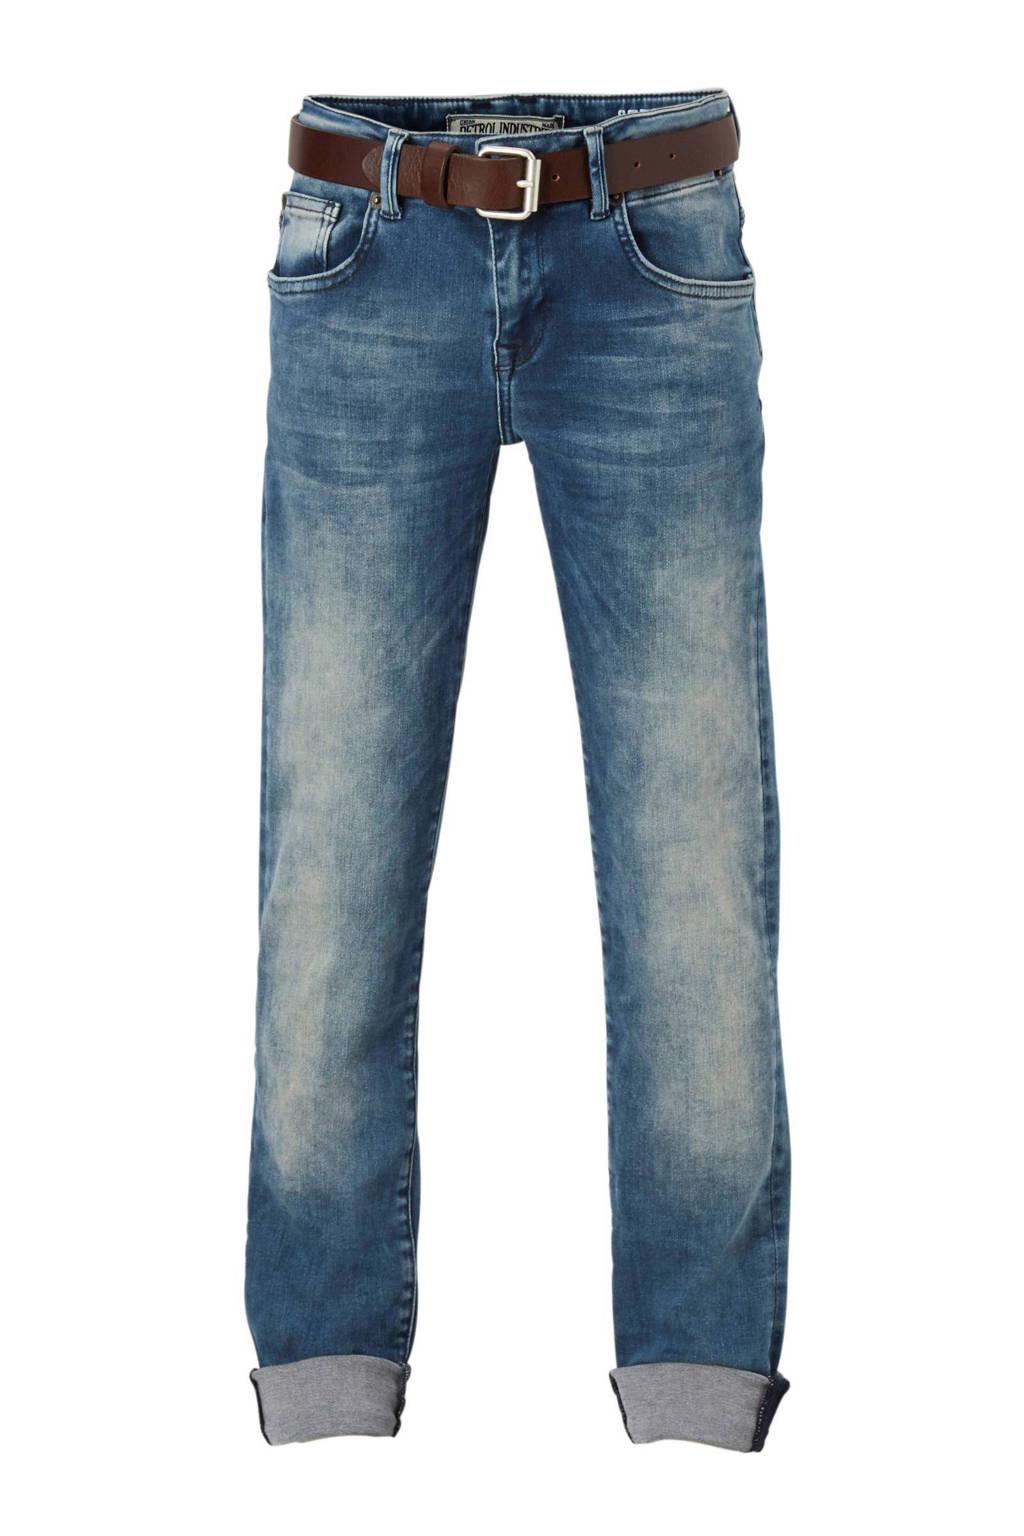 Petrol Industries Seaham slim fit jeans, Light stonewashed